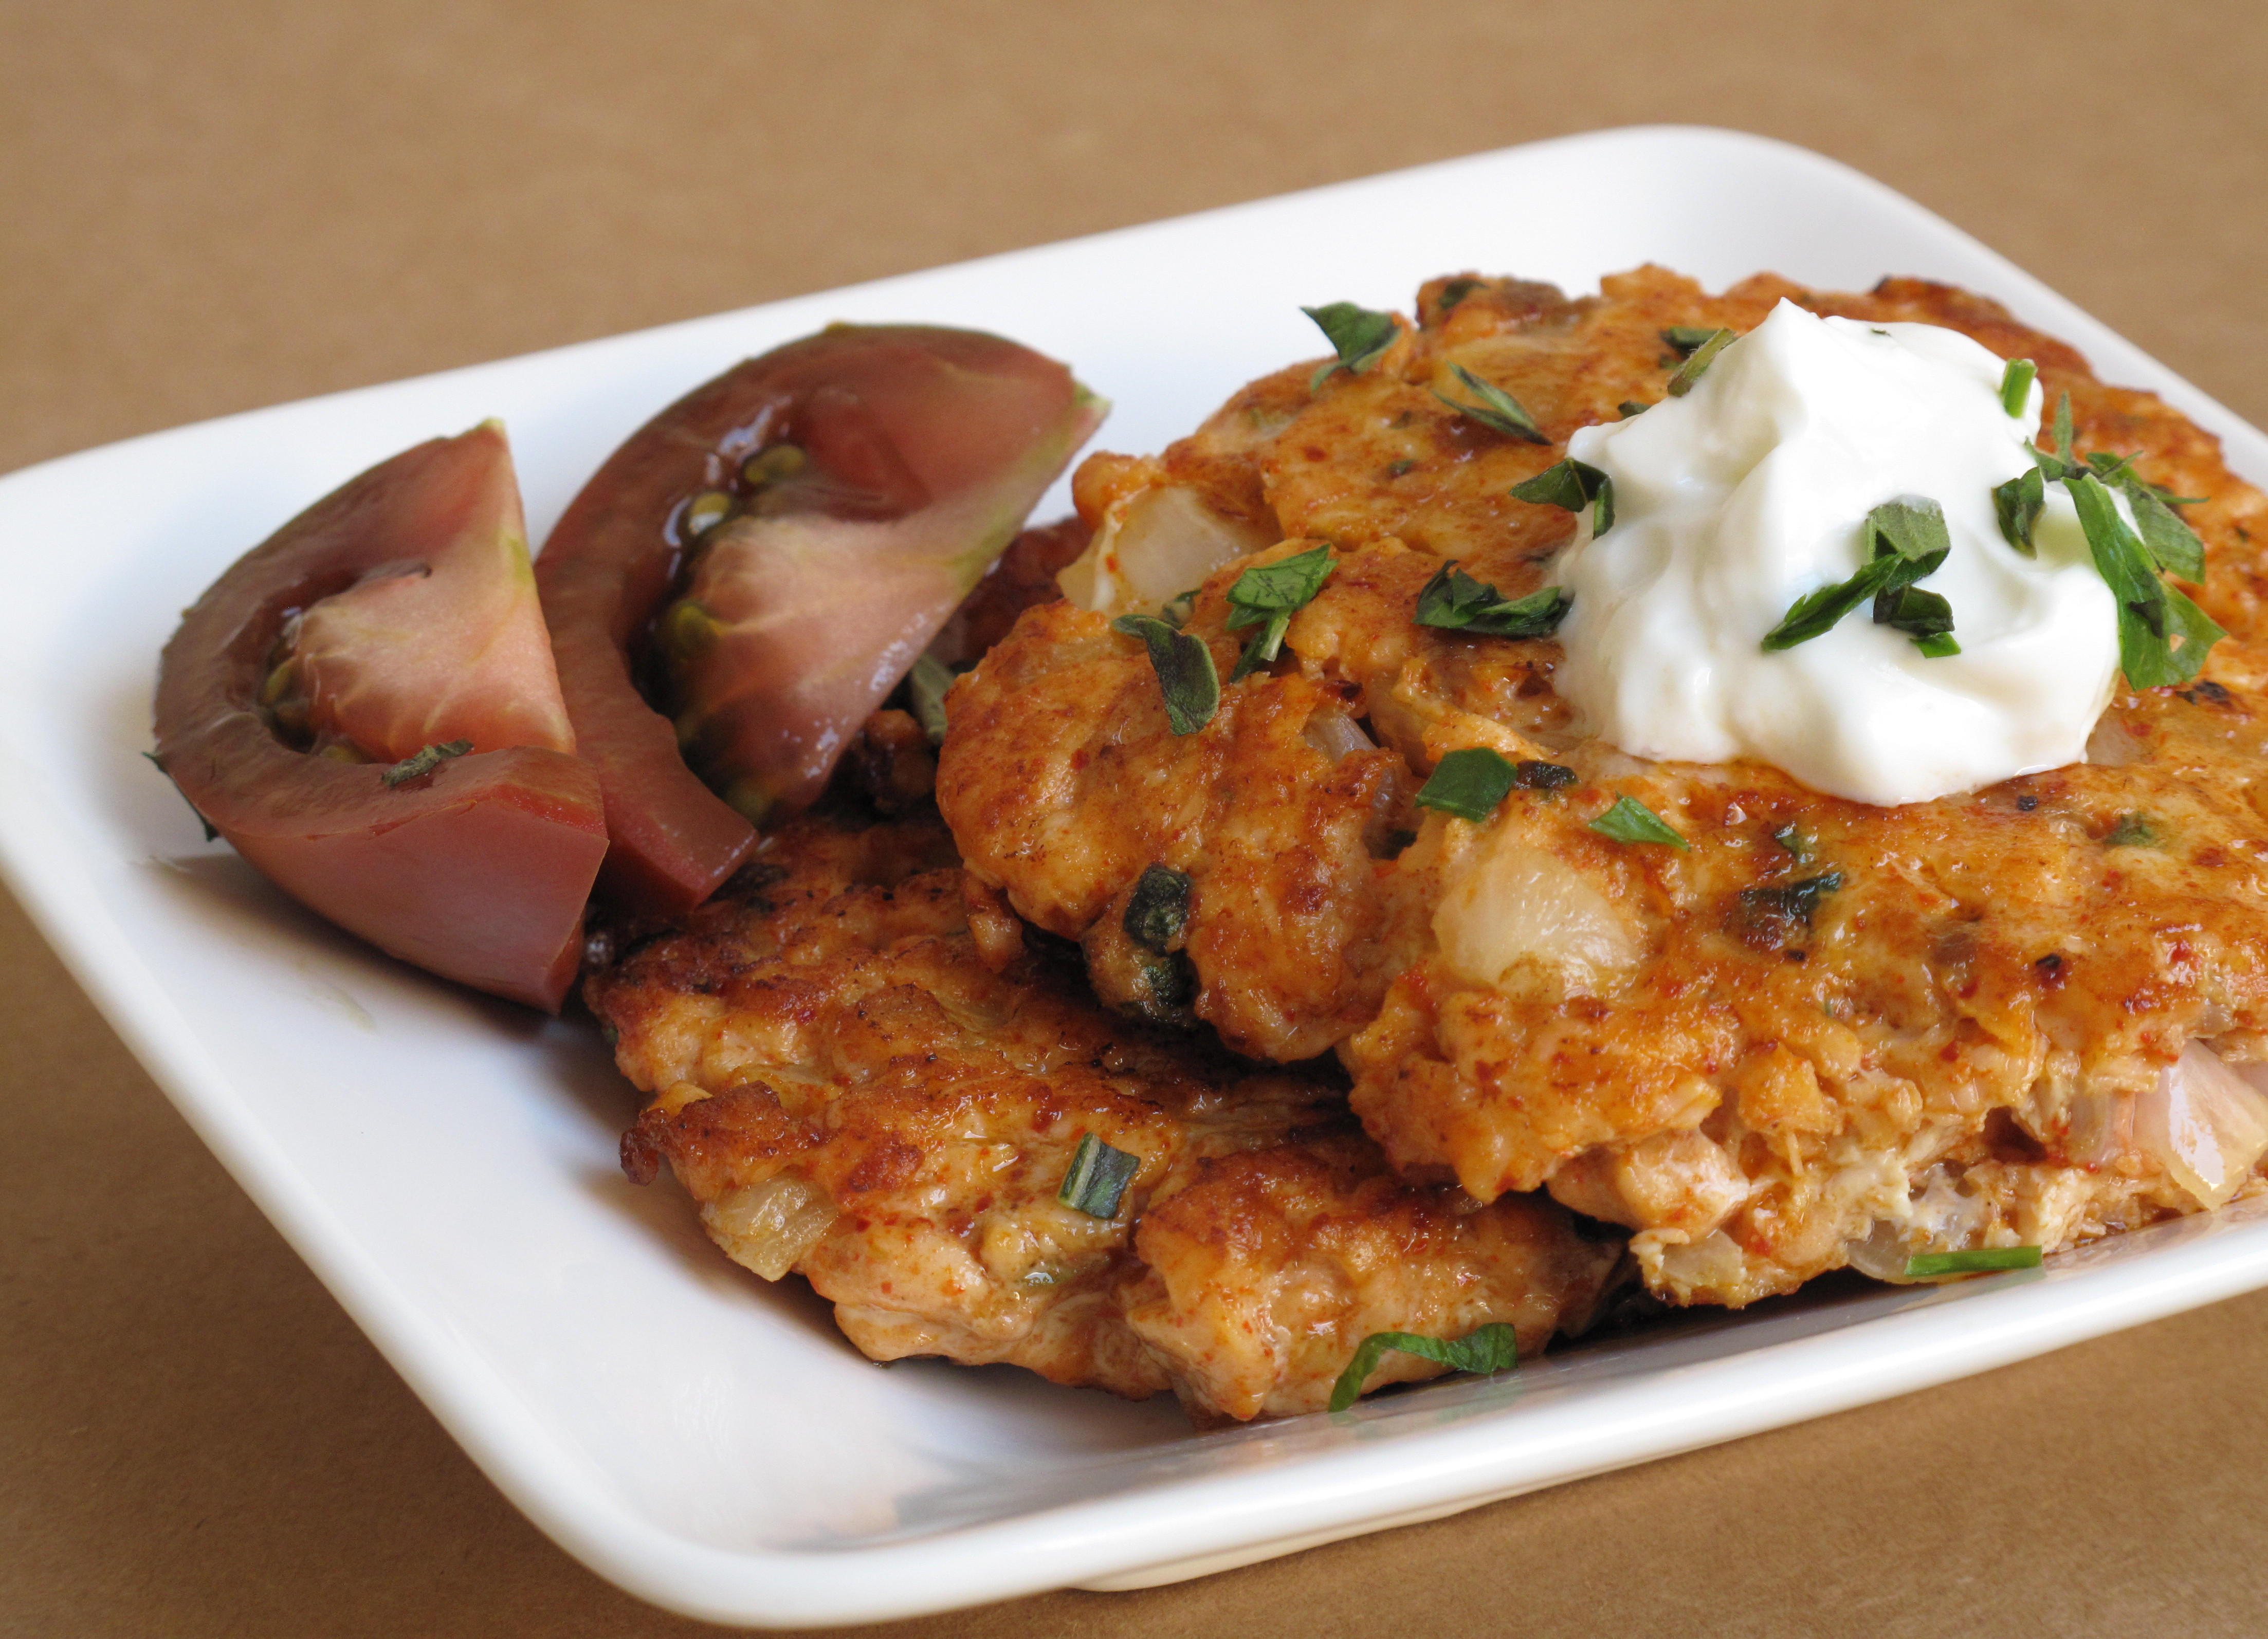 Salmon For Breakfast Healthy  Healthy Spa Recipe For Breakfast Salmon Sausage Patties